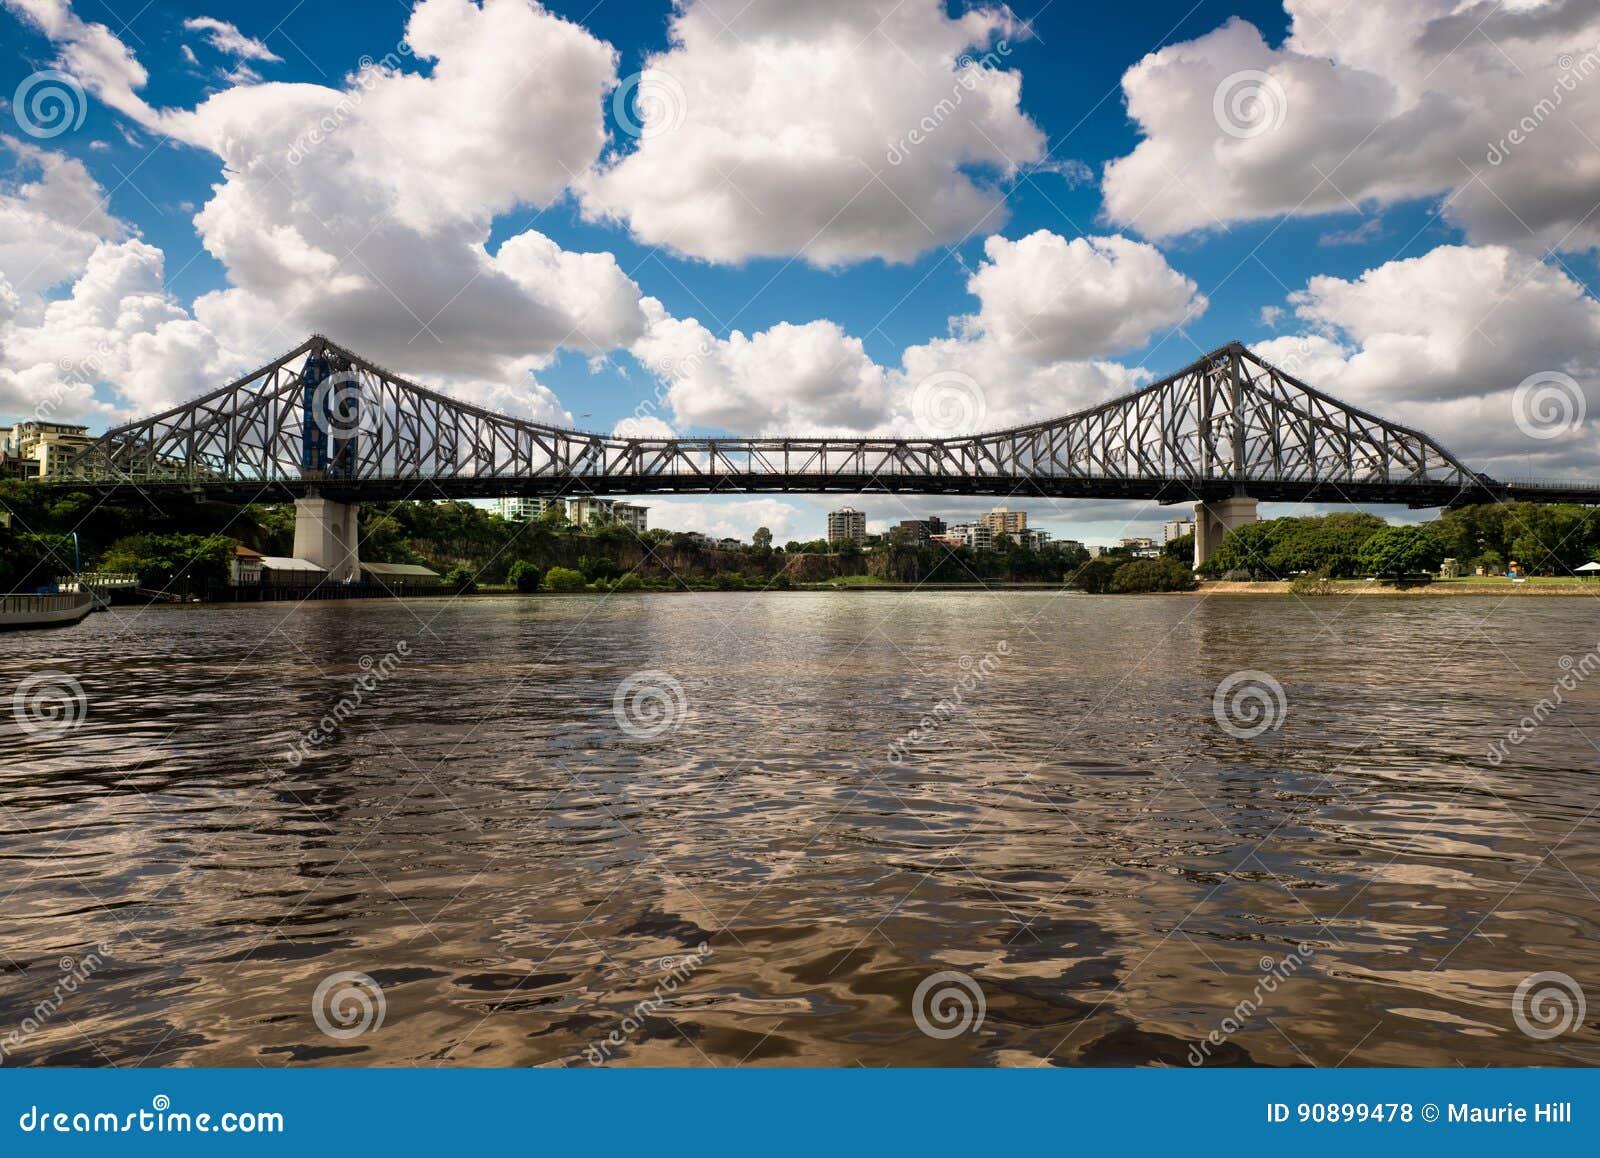 Puente famoso de la historia del ` s de Brisbane